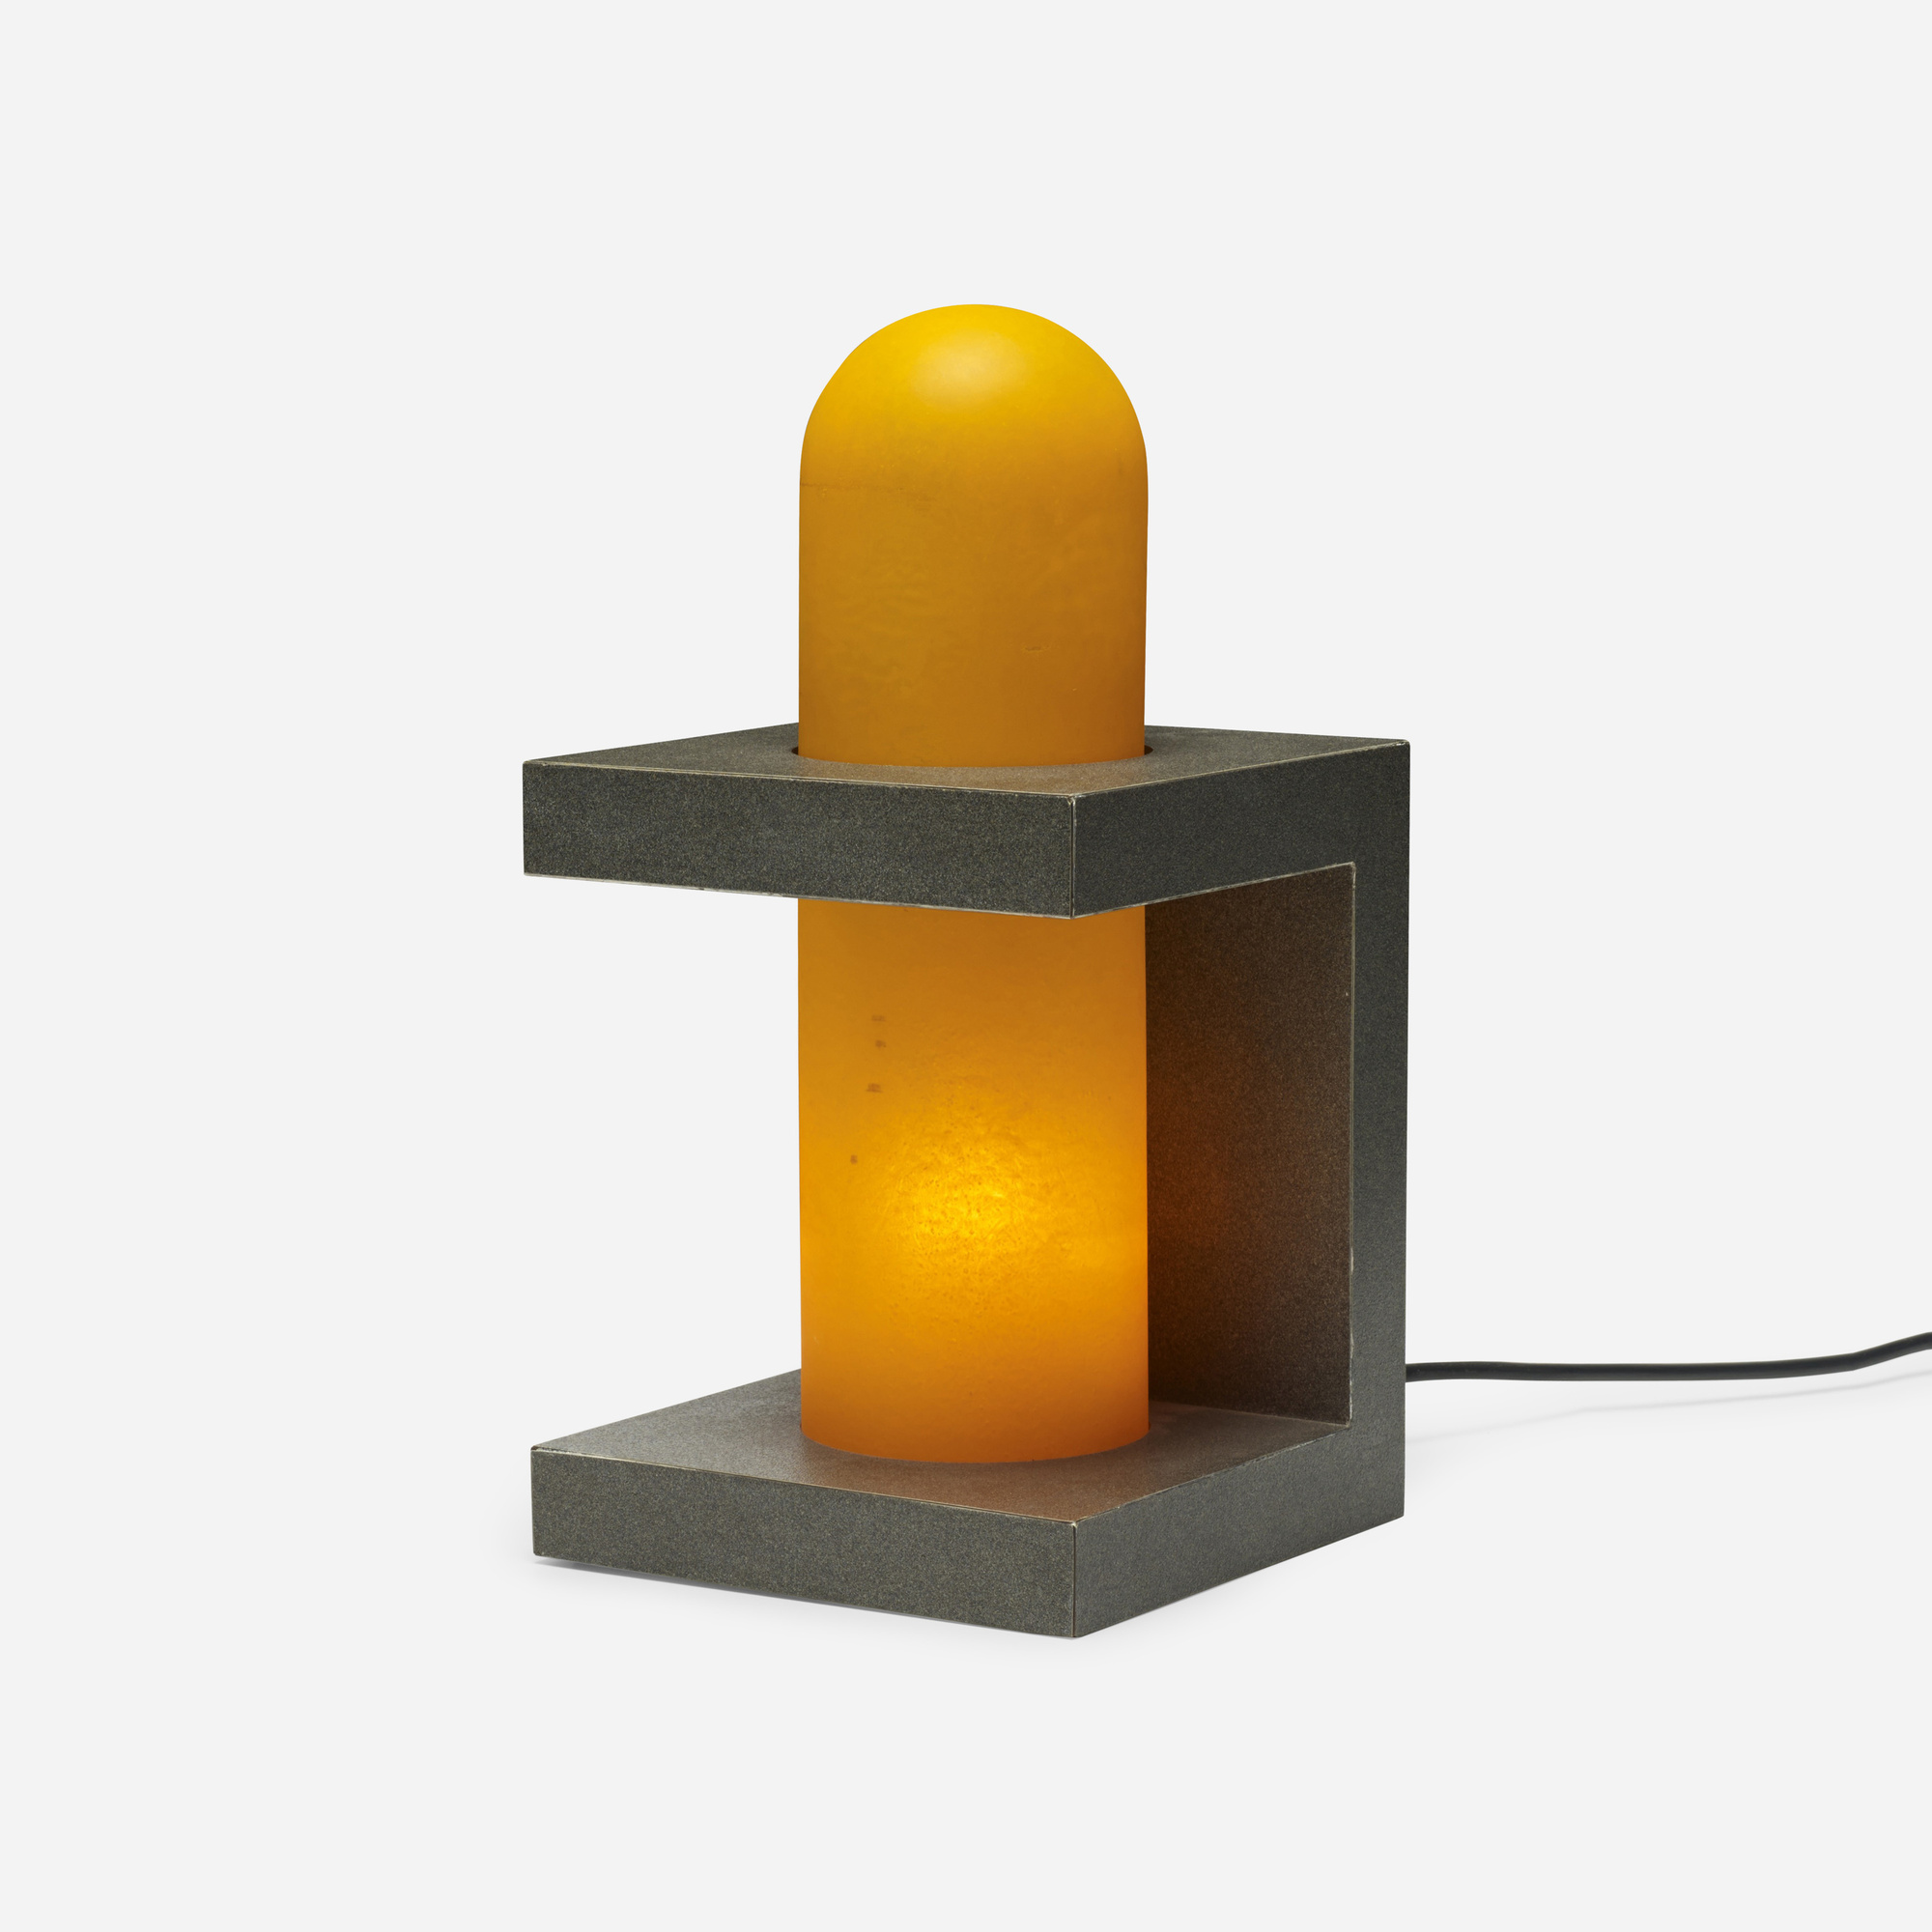 228: Johanna Grawunder / table lamp (1 of 2)